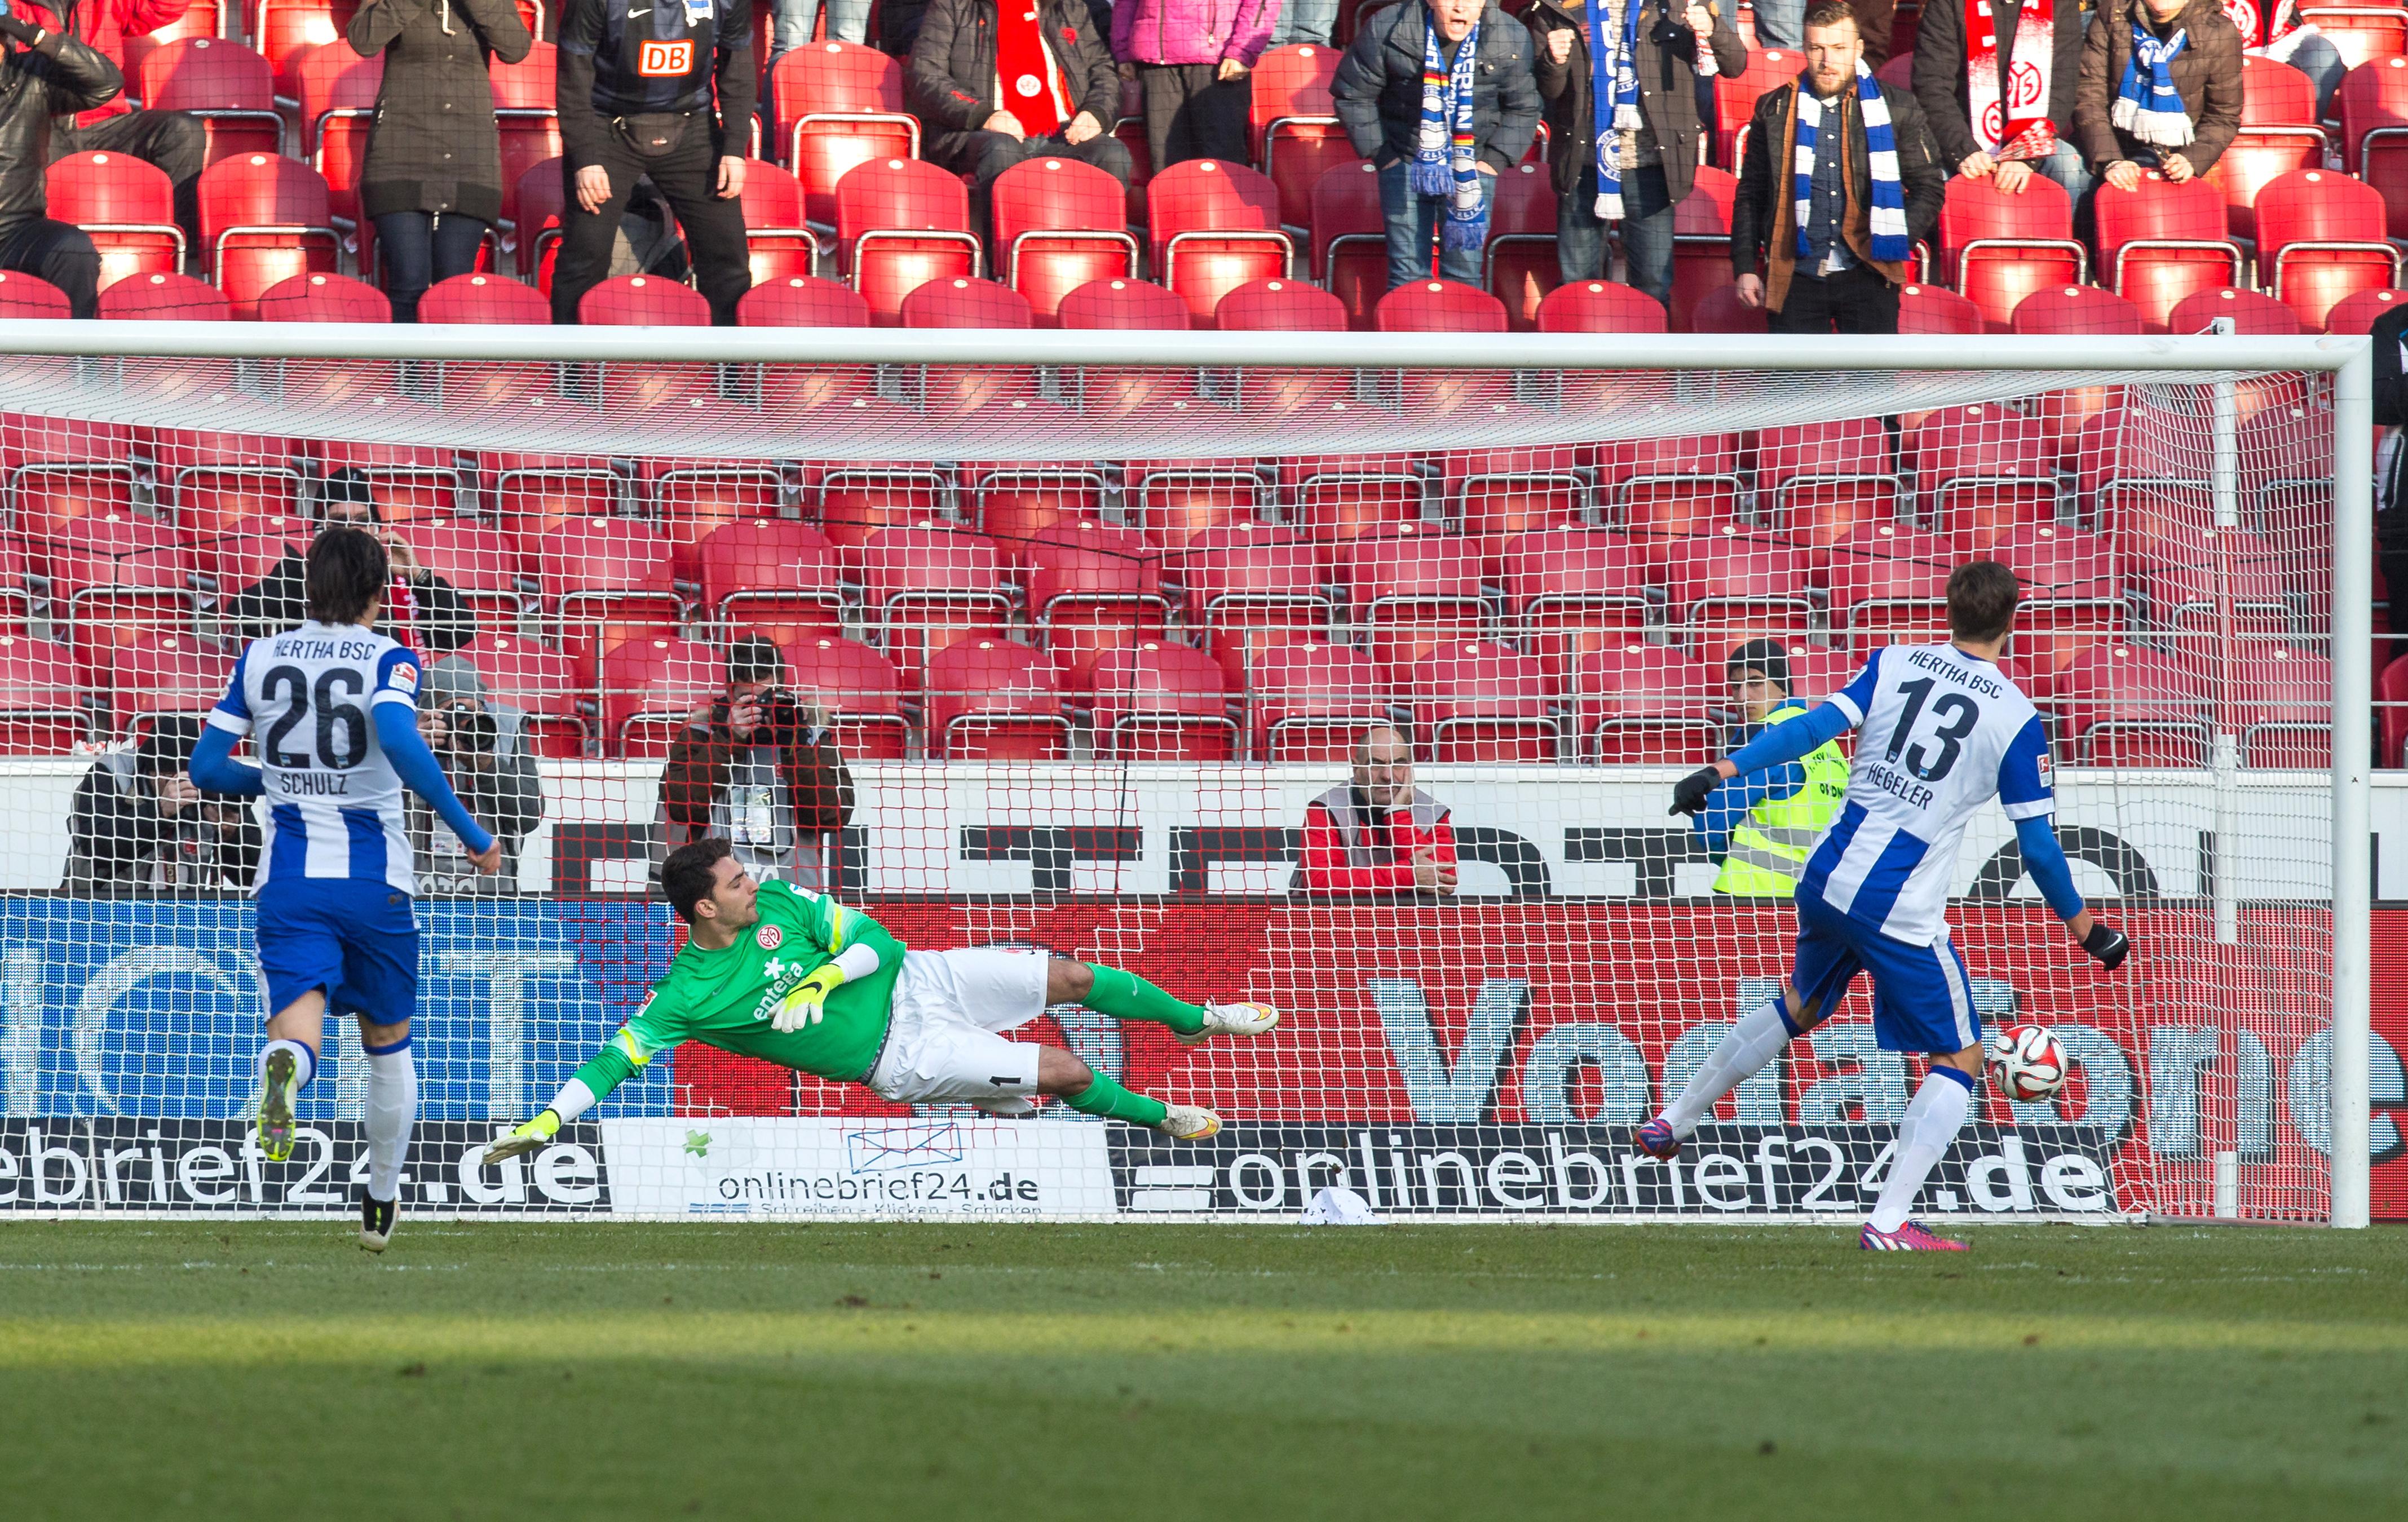 Jens Hegeler trifft per Elfmeter zum 1:0 gegen Mainz